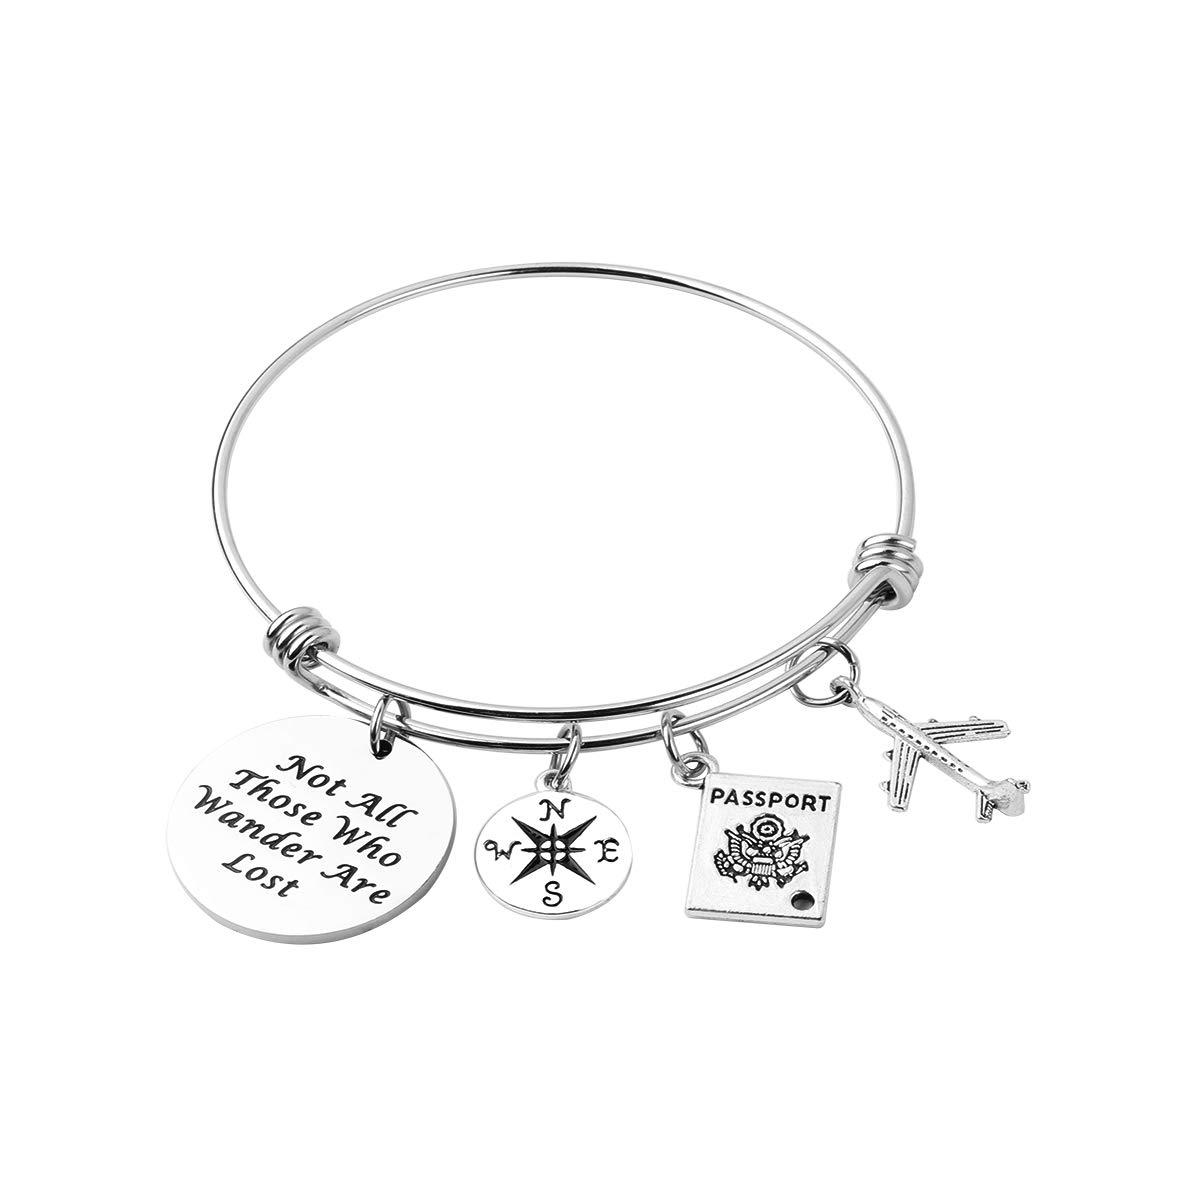 AZFEIYA Not All Those who Wander are Lost Bracelet Graduation Gift Adventure Bracelet Wanderlust Gift Traveler Bracelet (Silver Bracelet)